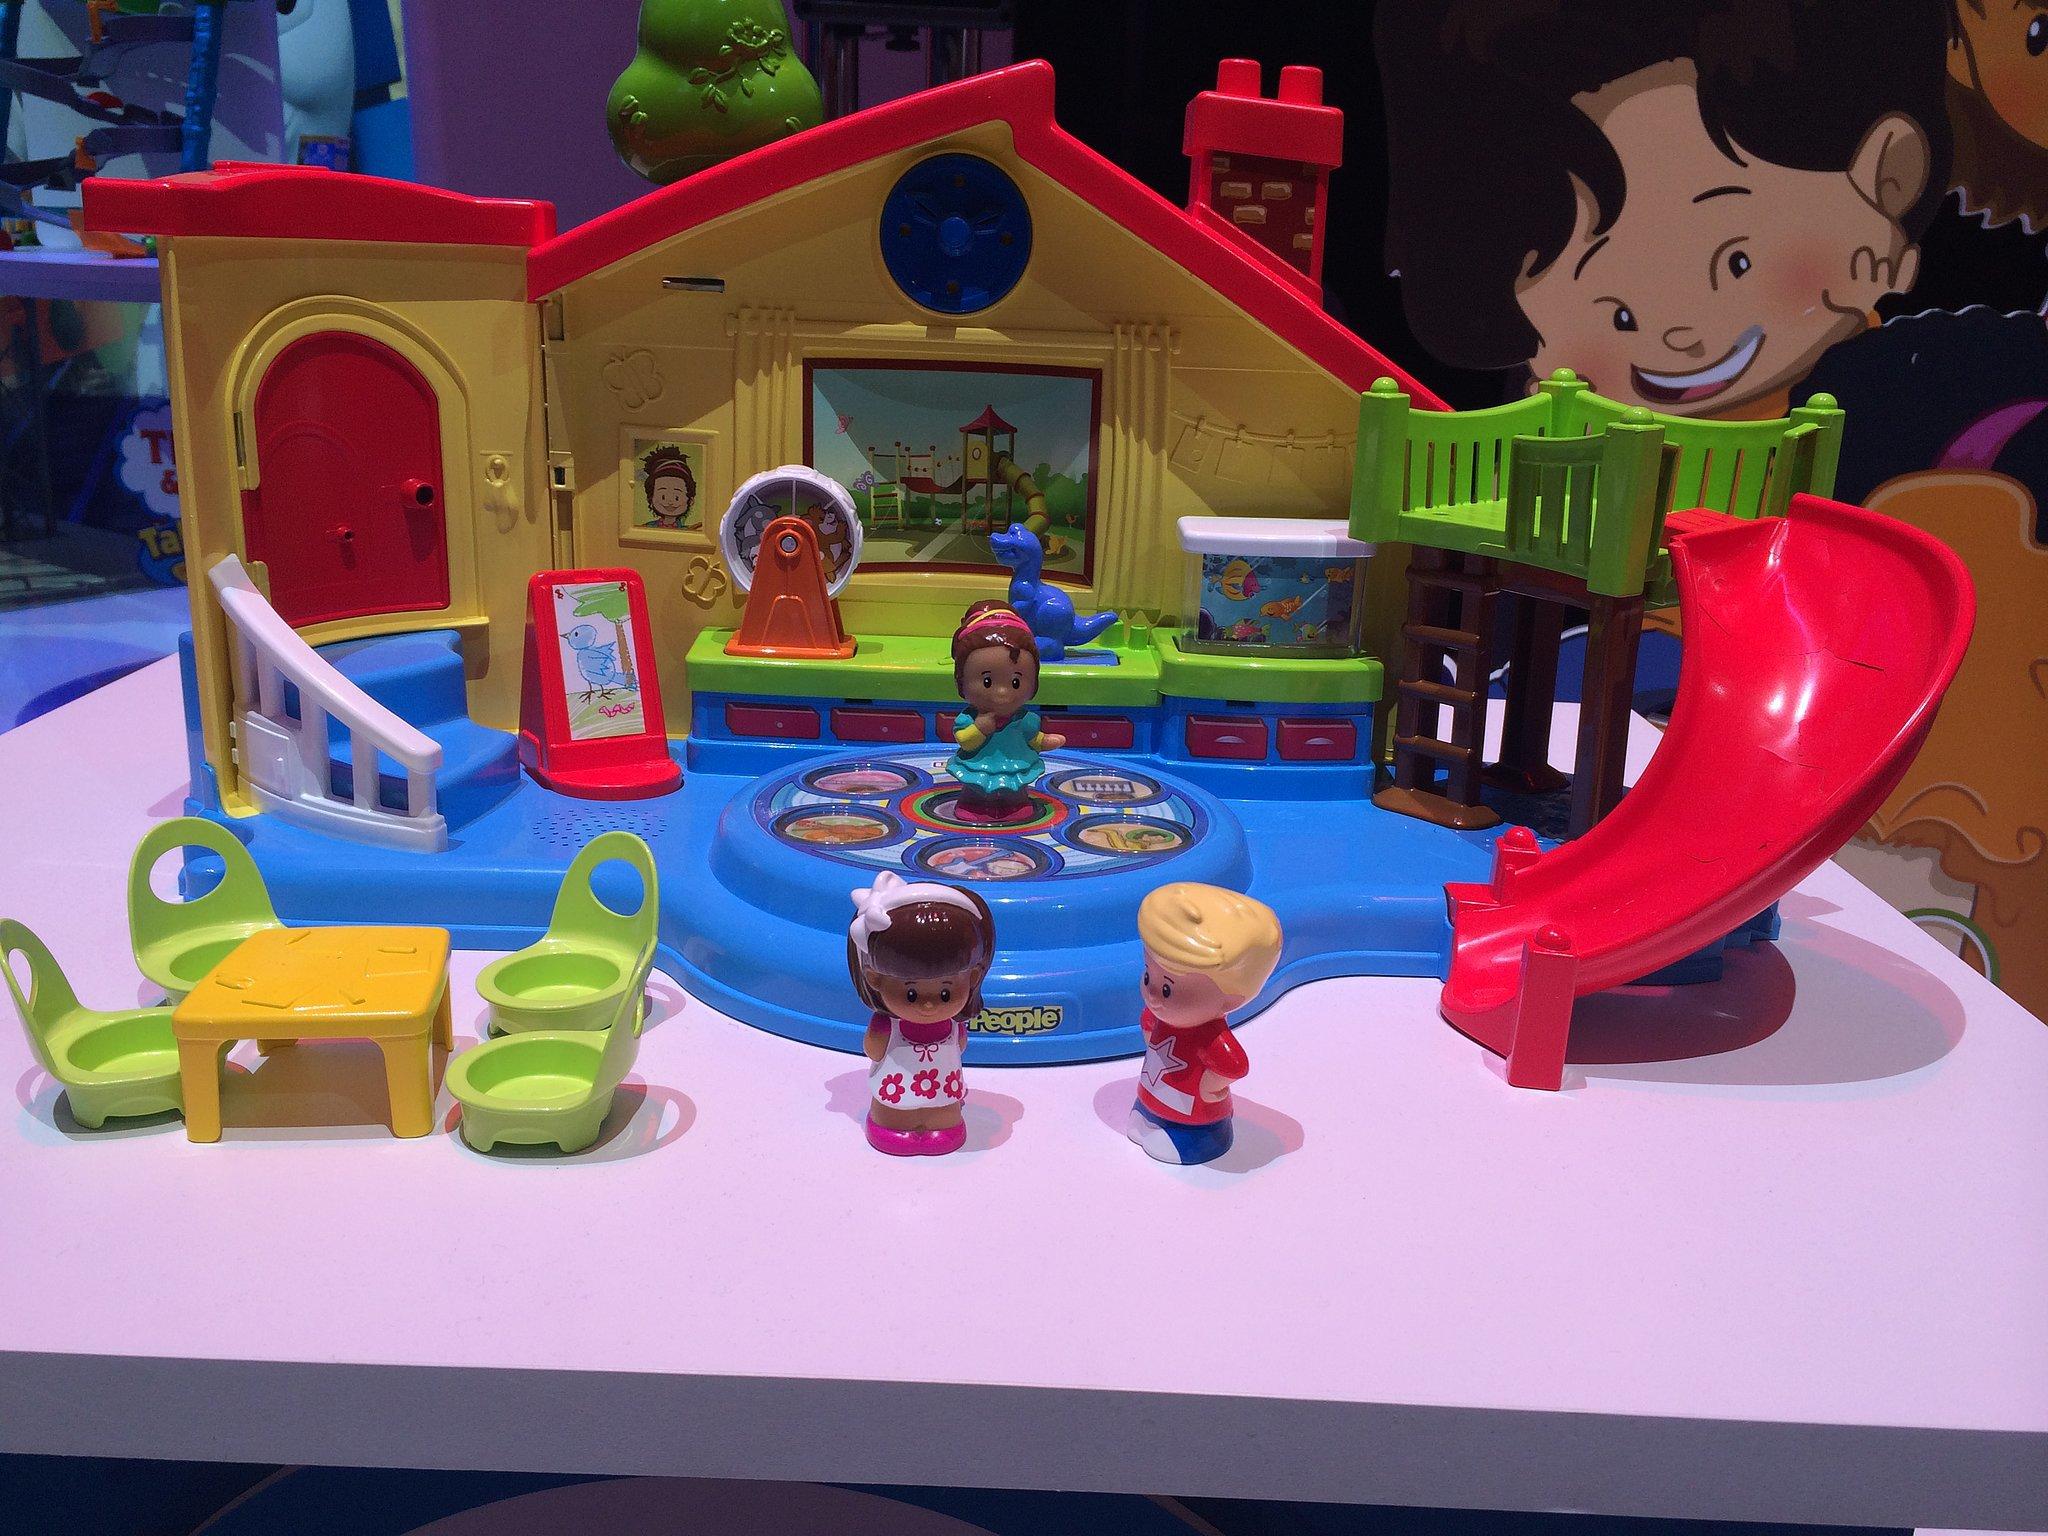 Little People Playhouse